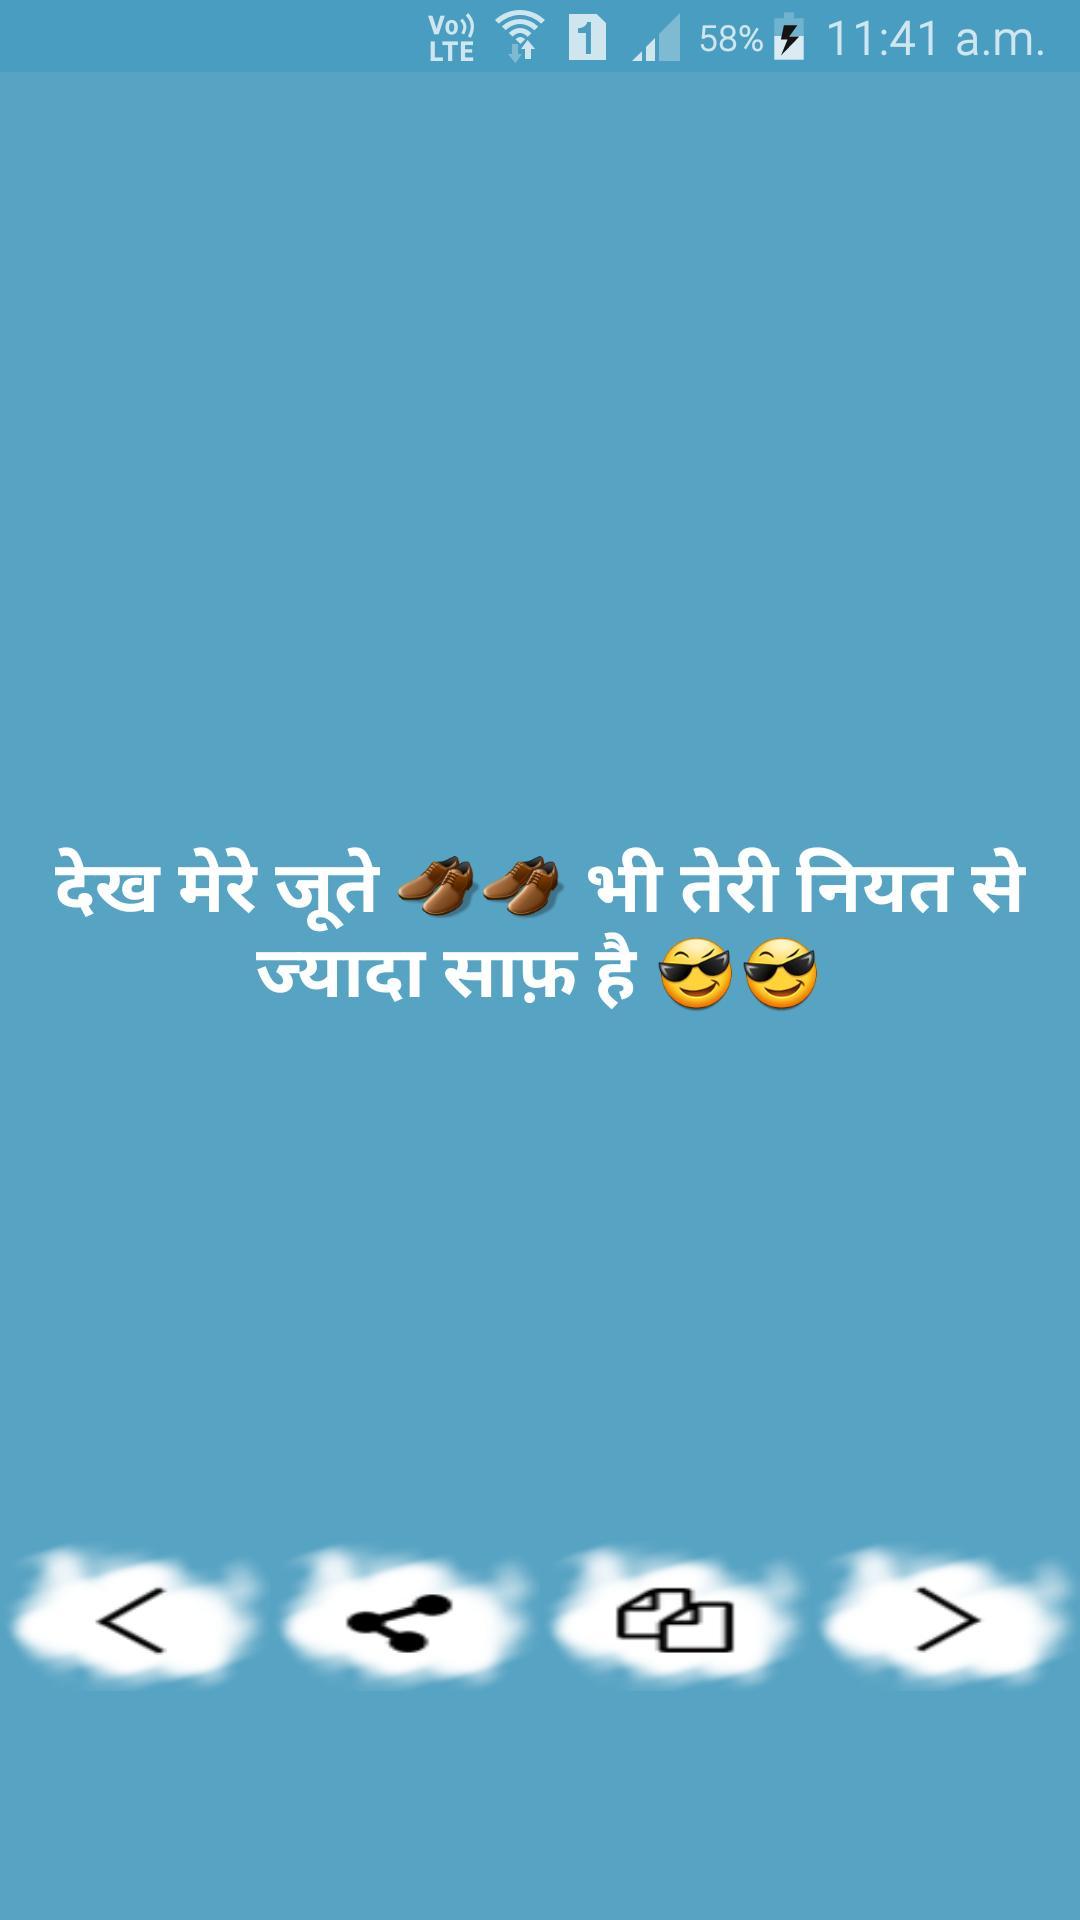 Killer Attitude Status 2018 in Hindi for Android - APK Download